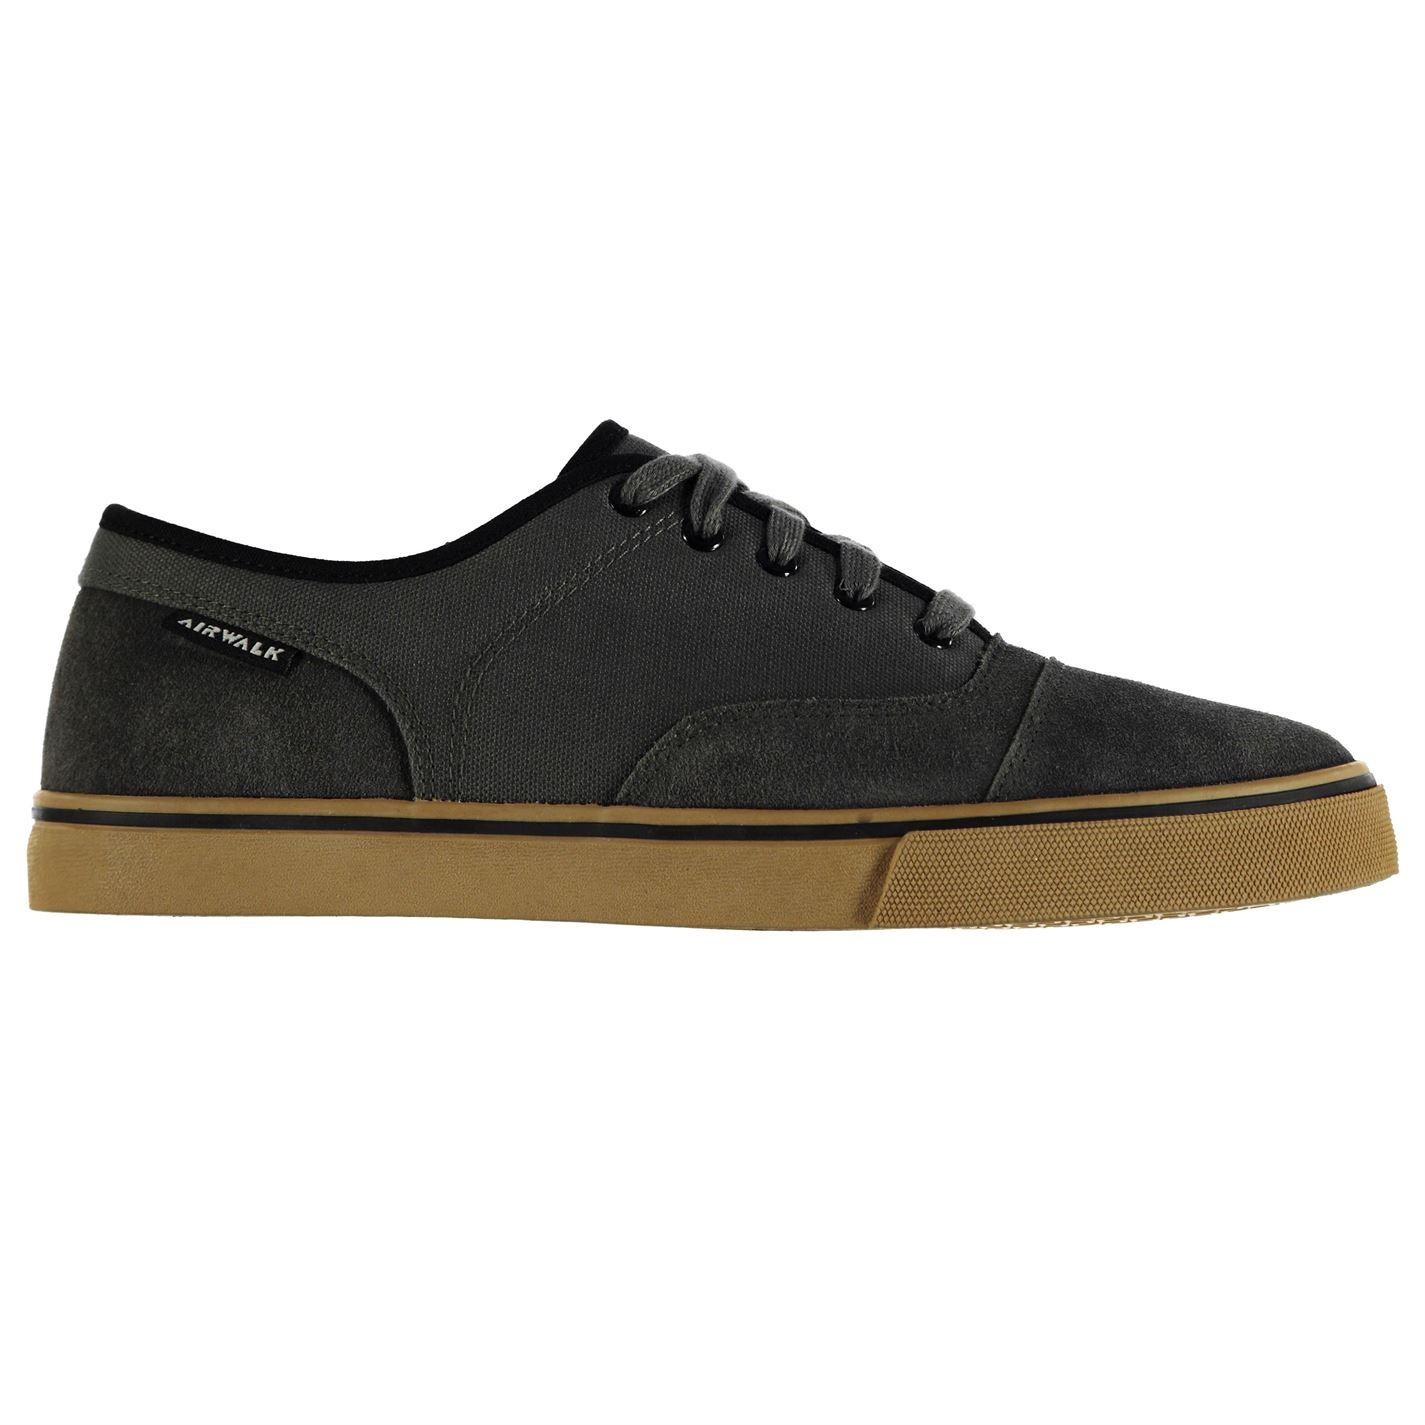 Airwalk Tempo Canvas Shoes pánské Dark Grey - Glami.cz 0dee655c80